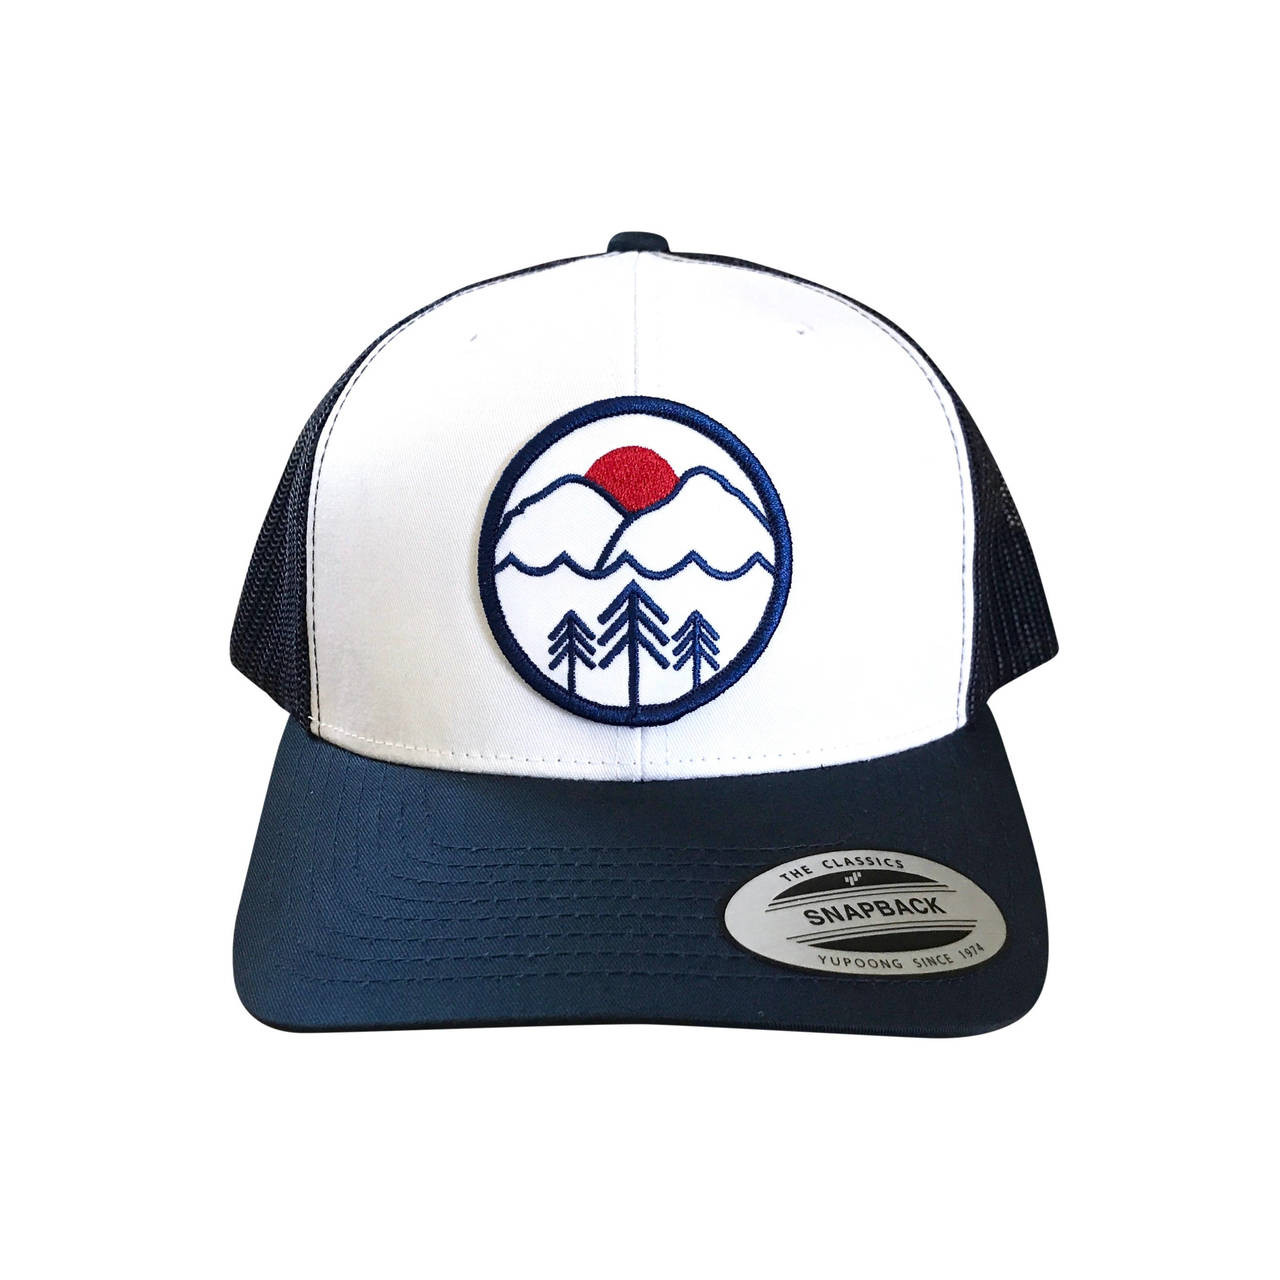 41bc7035310b1 Pacific Northwest adult trucker hat